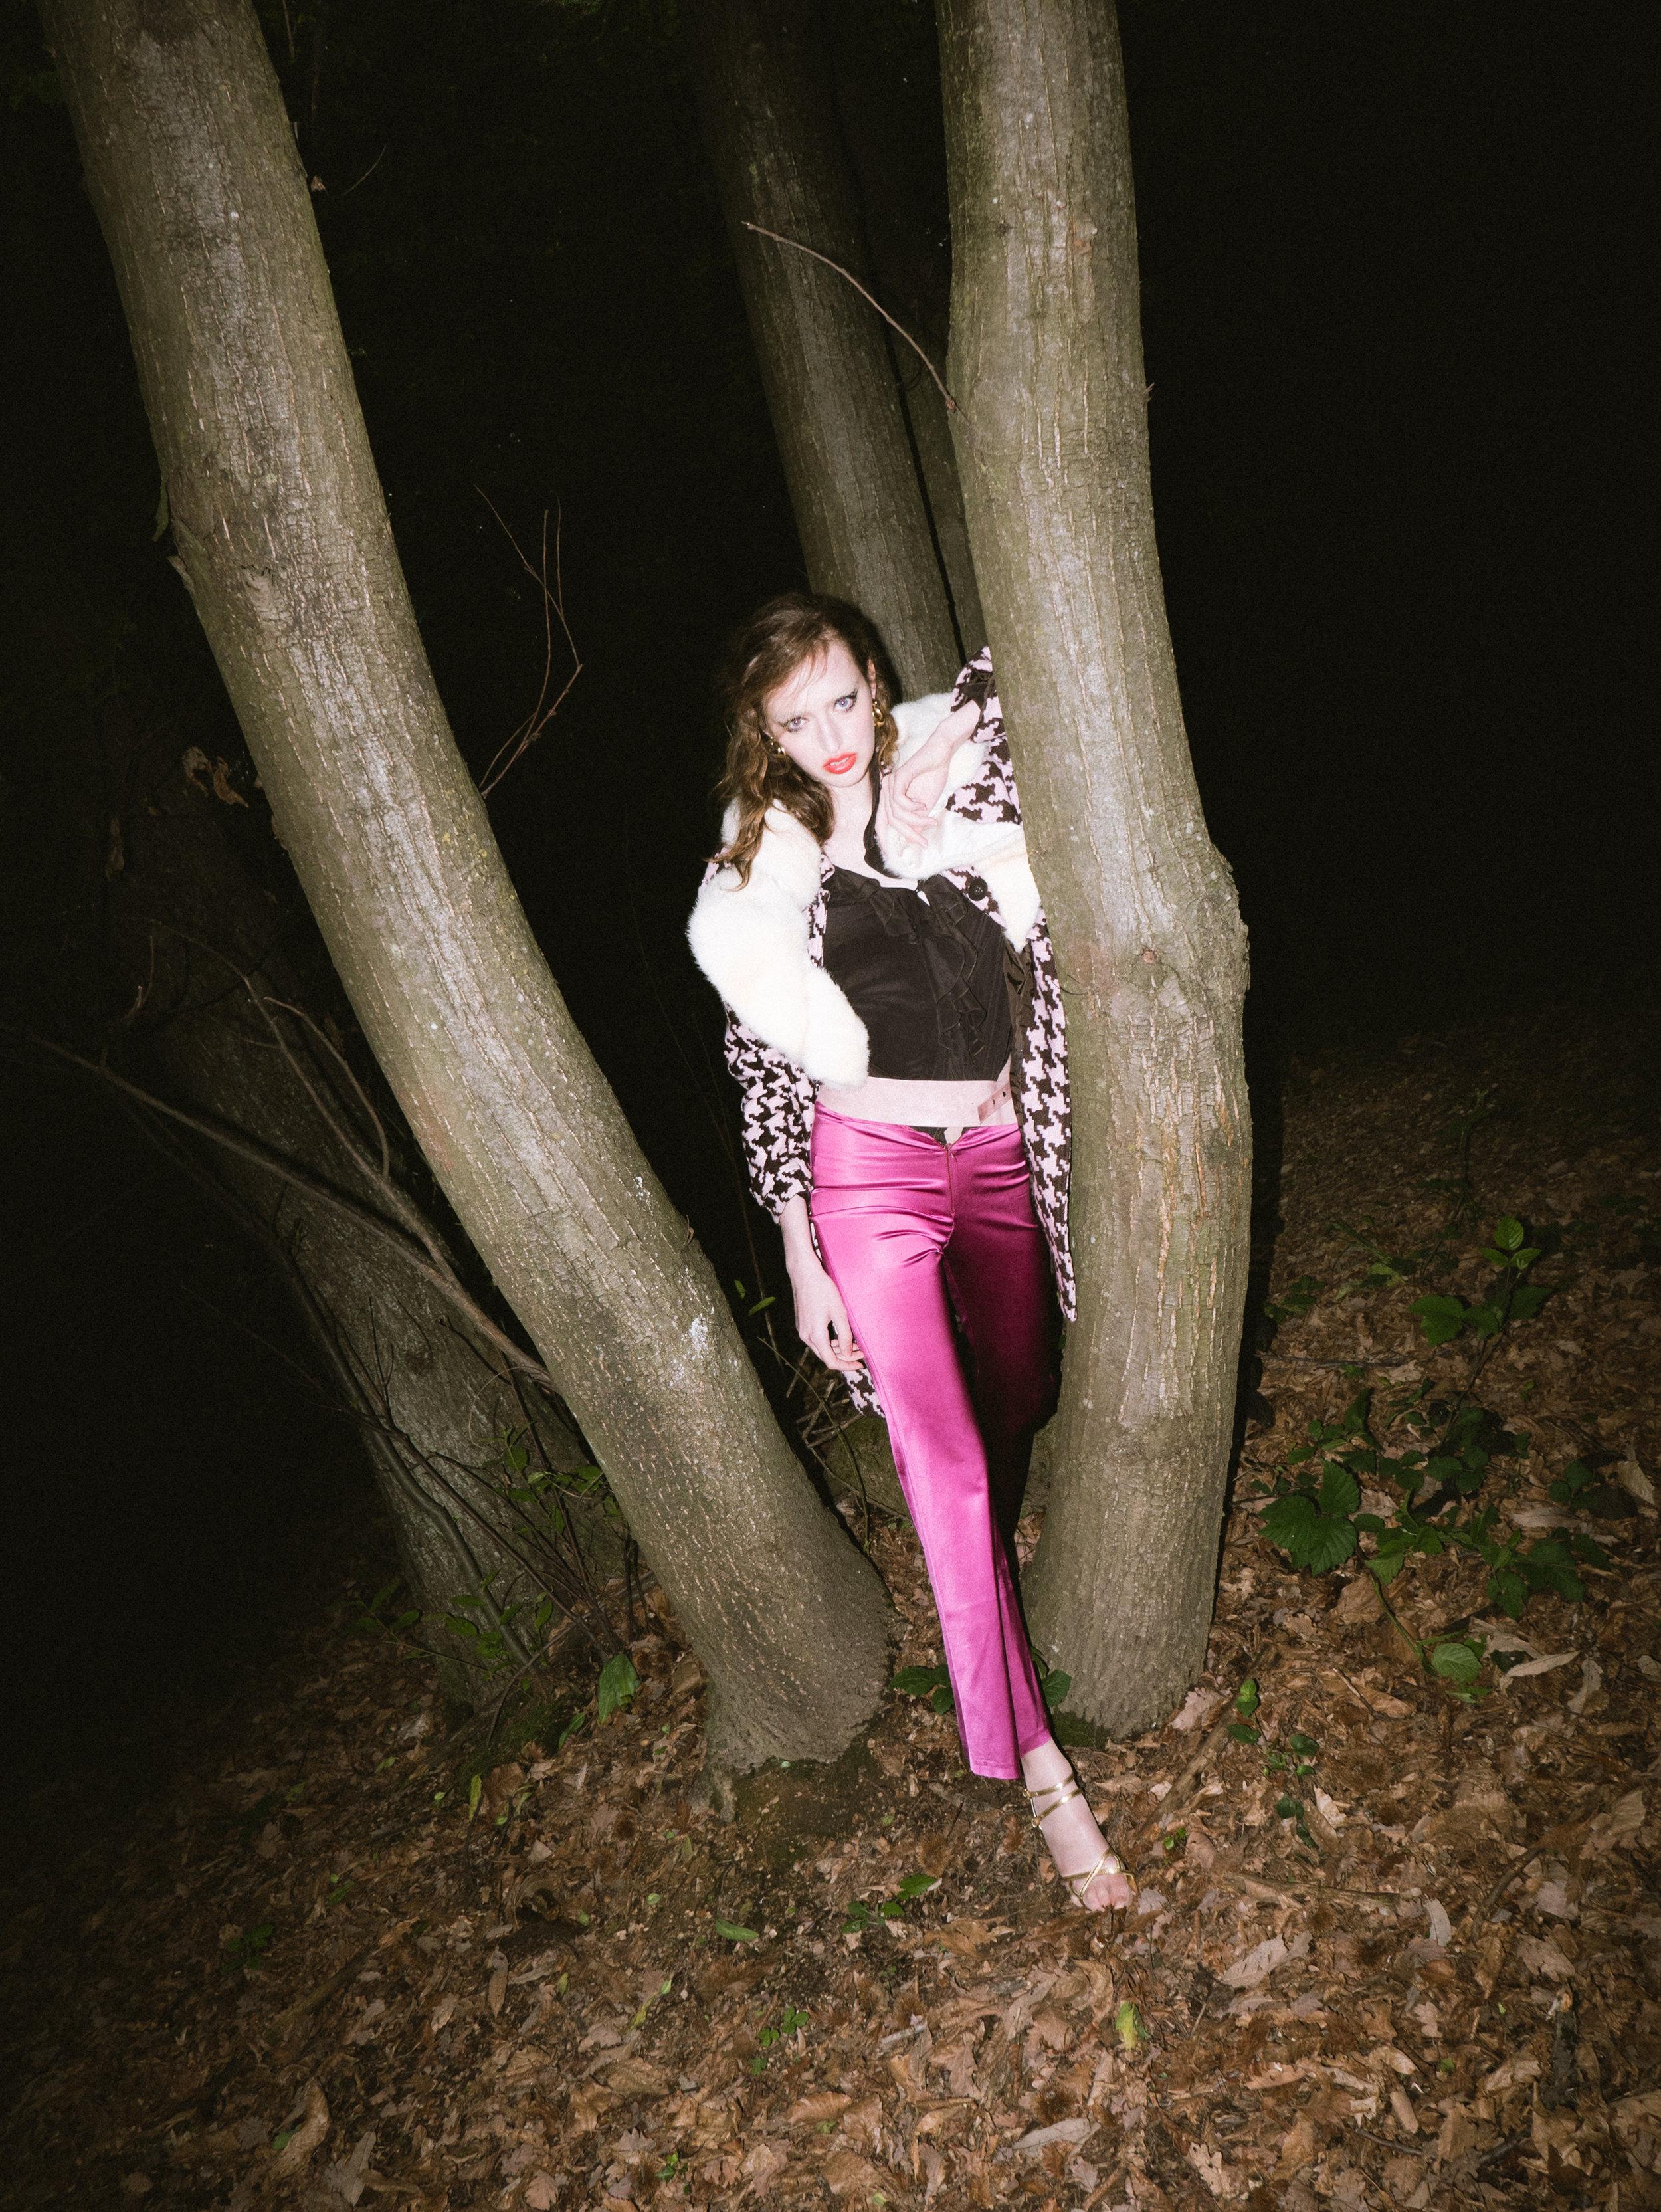 sami oliver nakari_dark woods_10.jpg